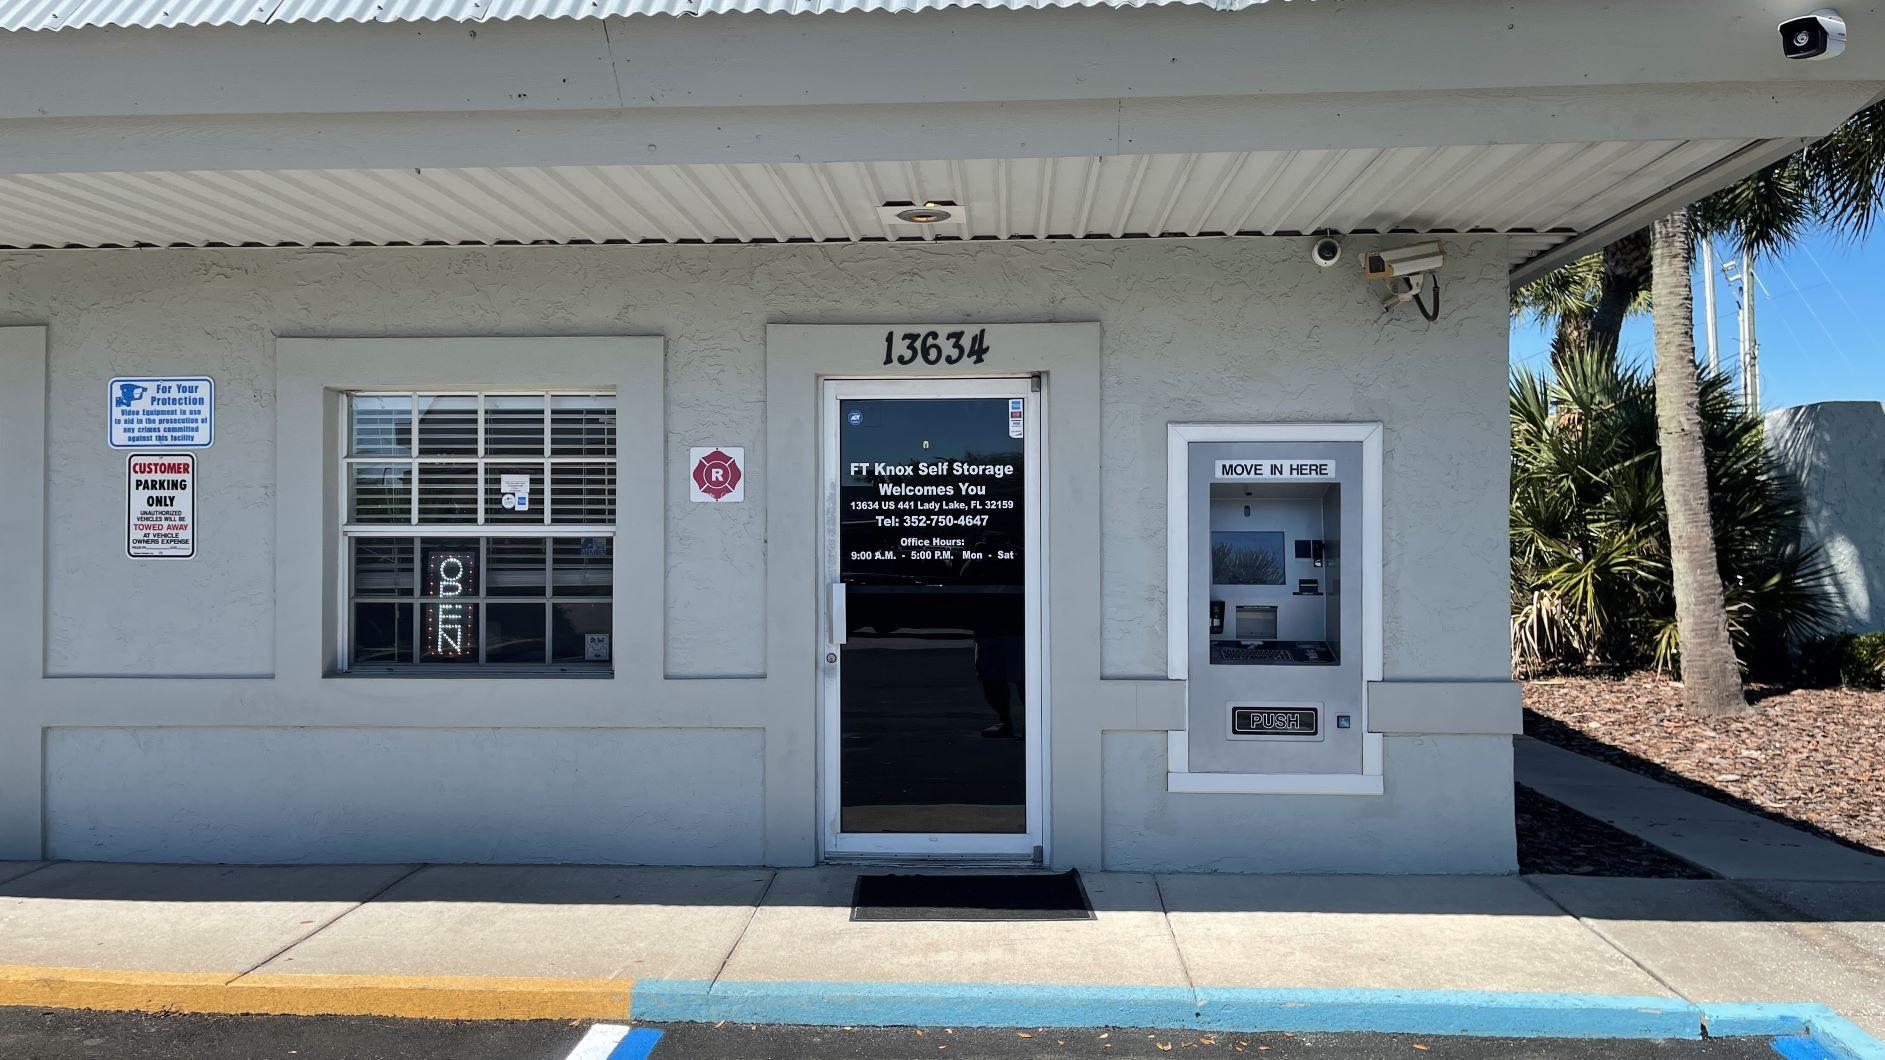 Fort Knox Self Storage at 13634 US-441, Lady Lake